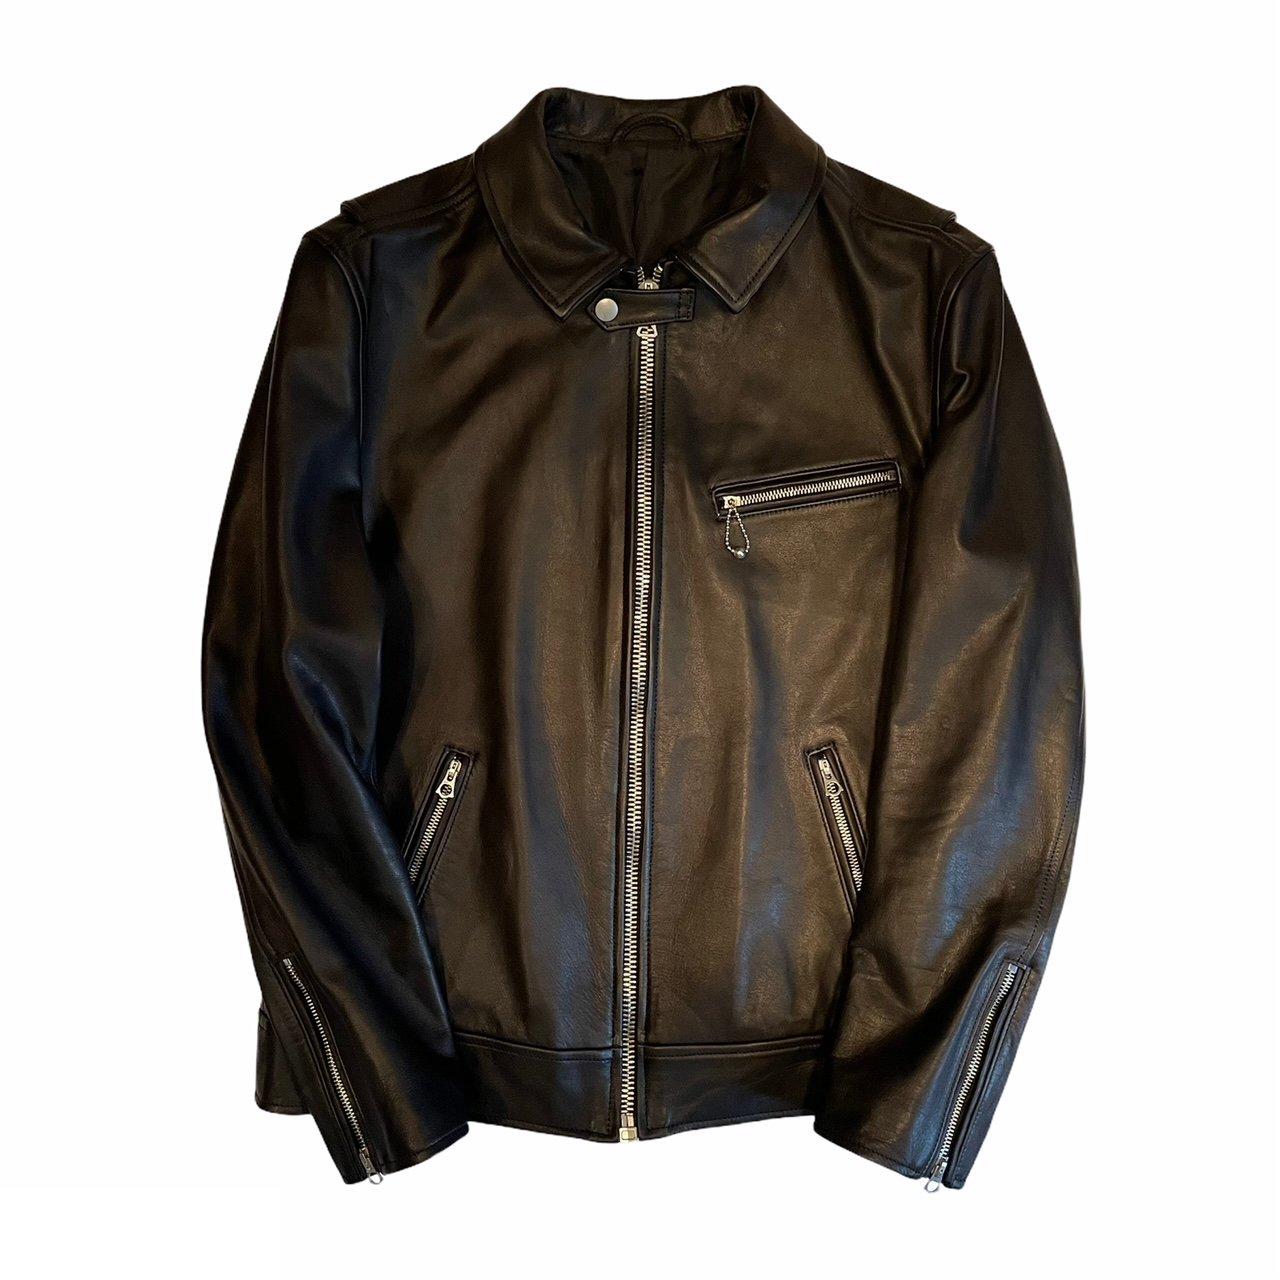 HOSU Sライダースジャケット(カウハイド)/ブラック